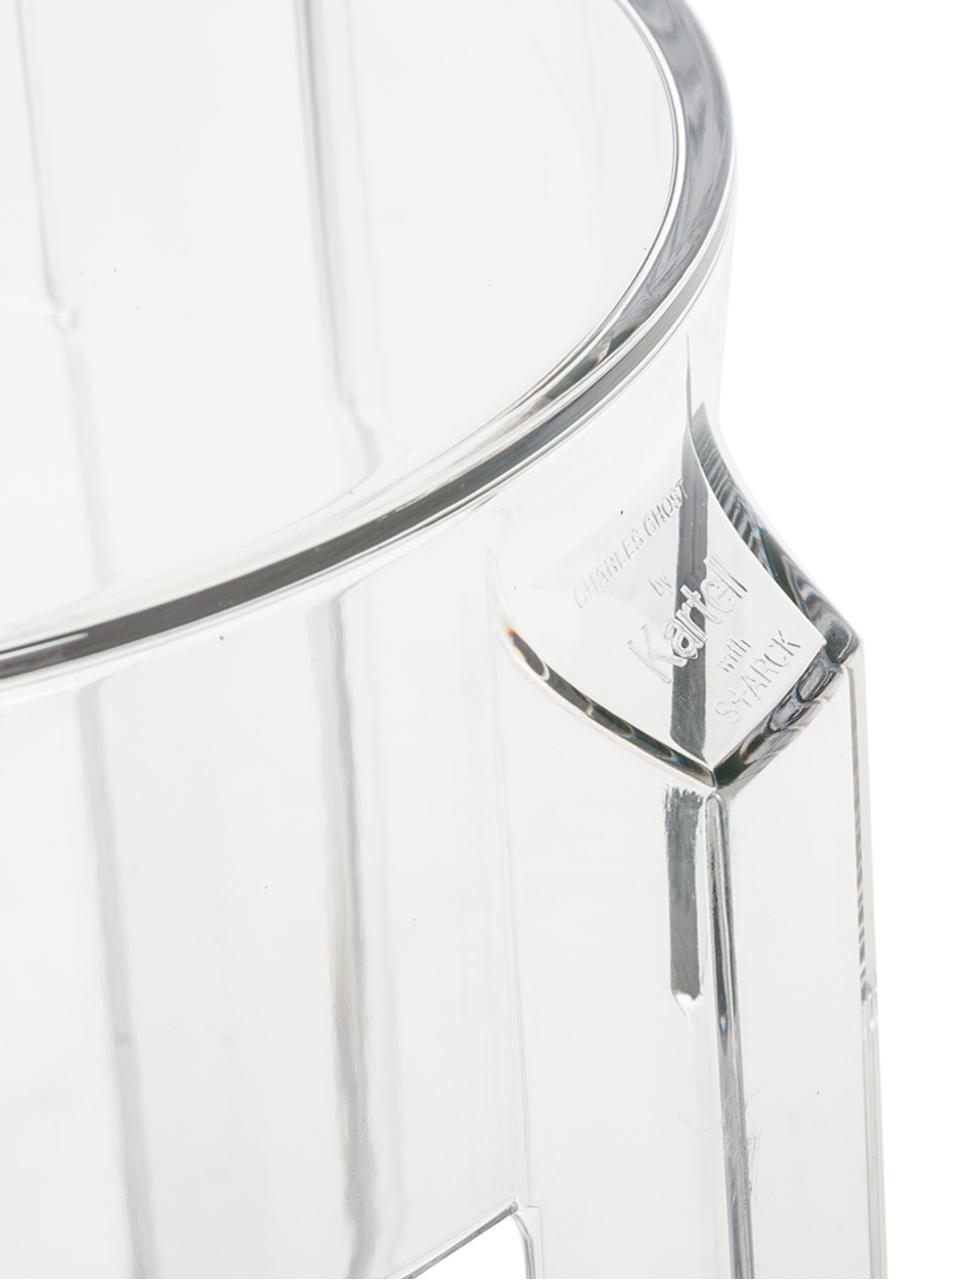 Transparenter Barhocker Ghost, Polykarbonat, Transparent, Ø 46 x H 75 cm